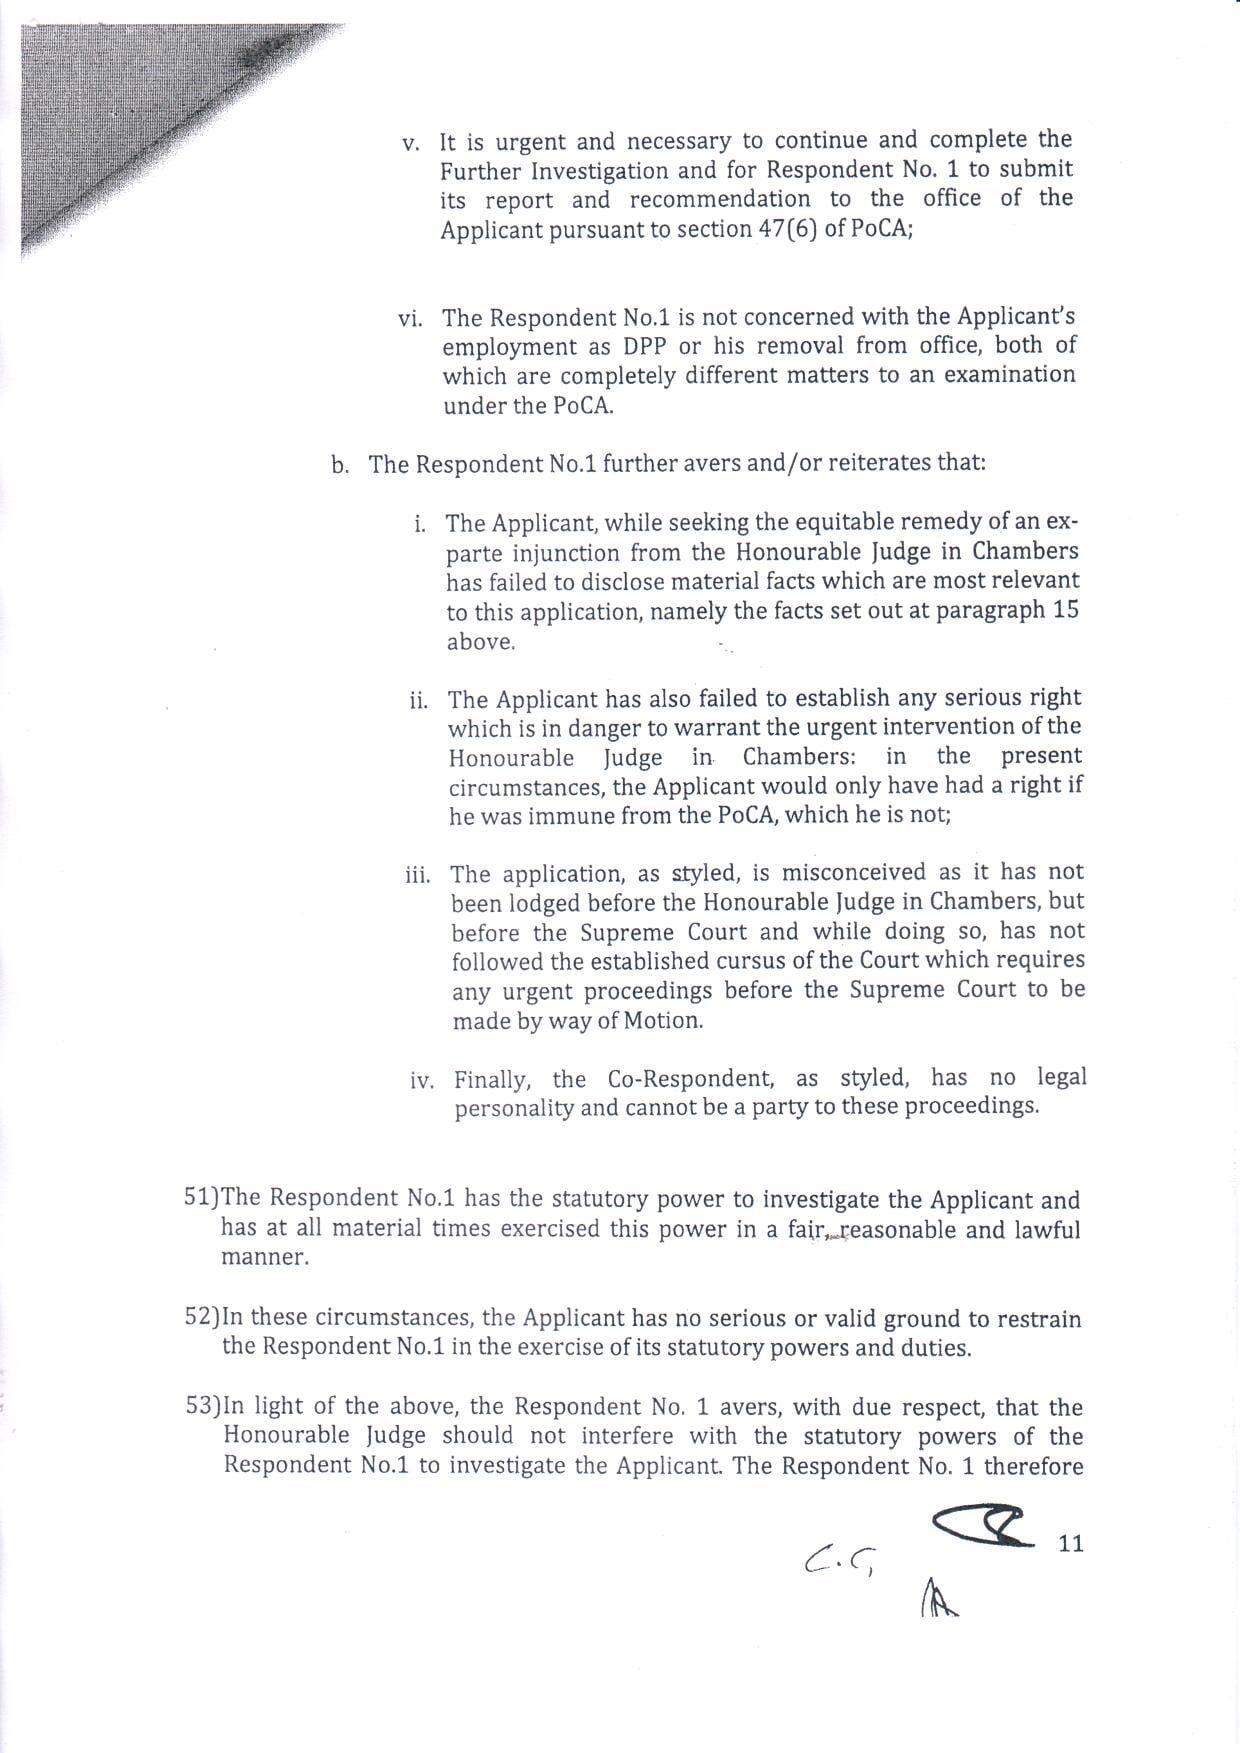 affidavit ICAC boolell 11